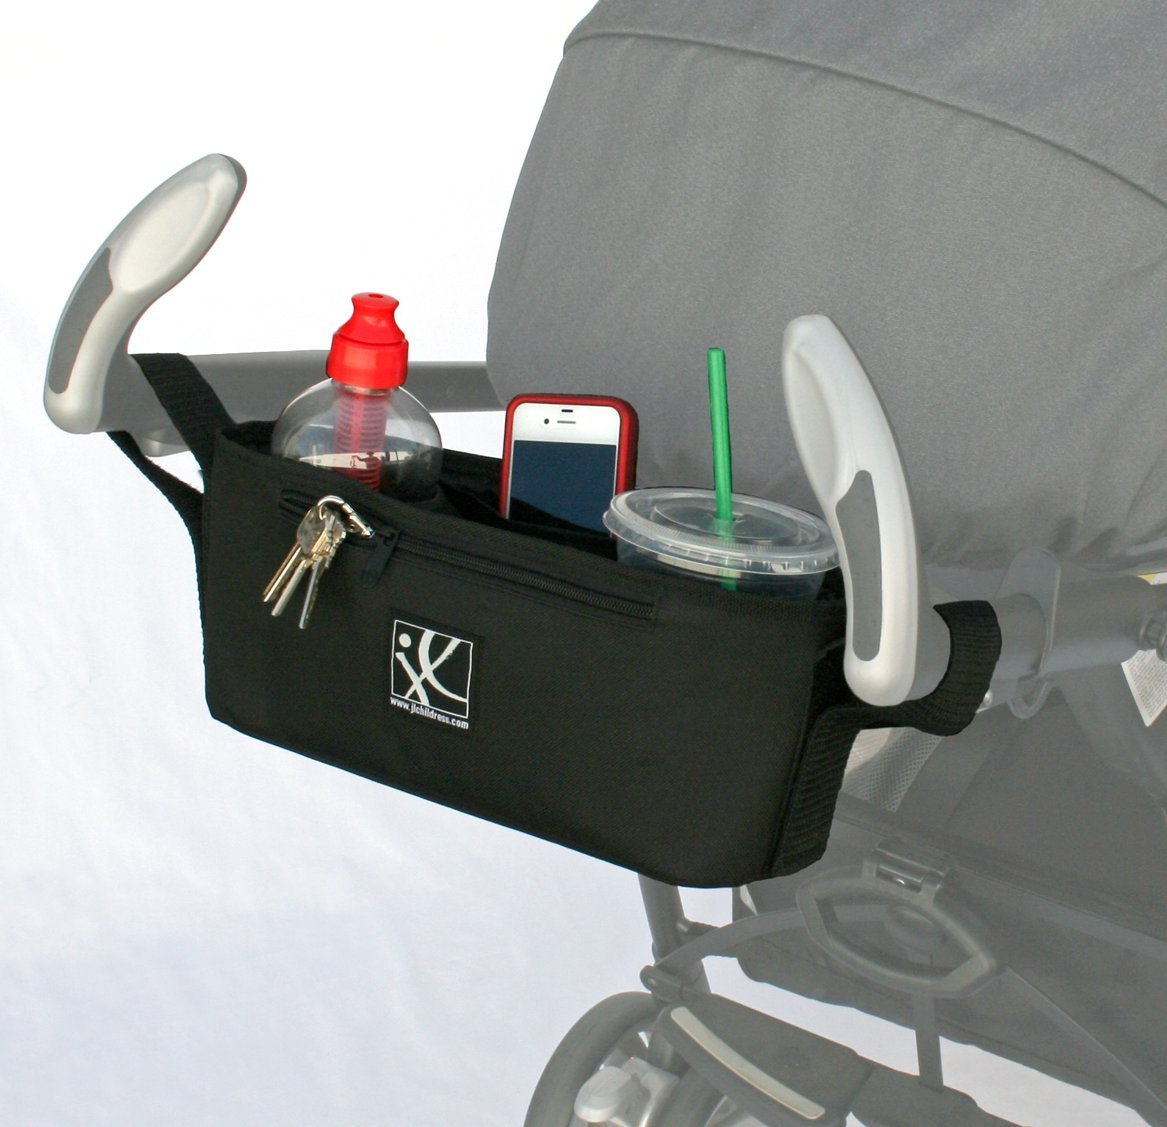 Amazon.com: J.L. Childress Cargo \u0027N Drinks Parent Tray, Black: Baby